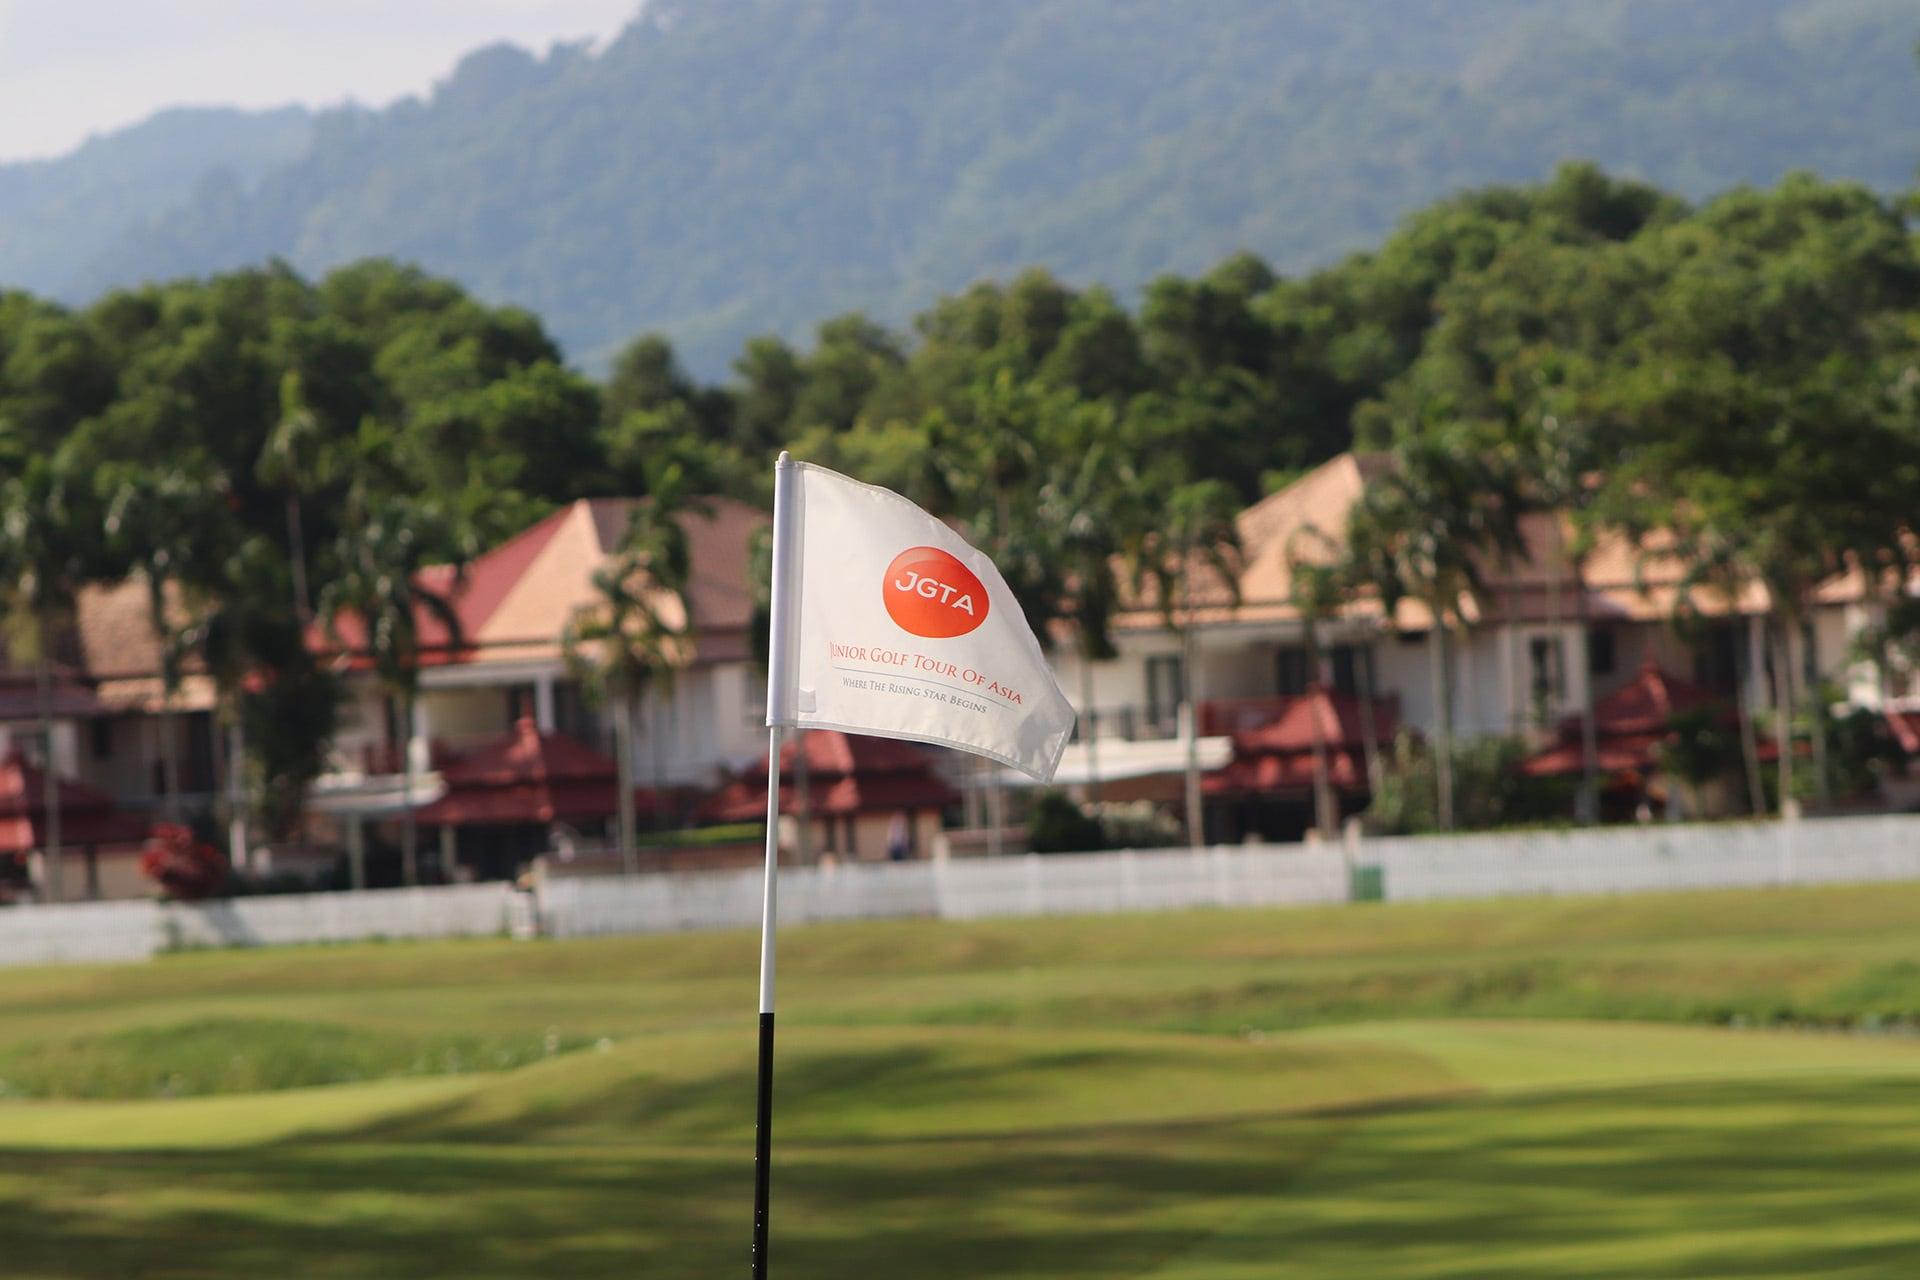 JGTA Phuket Junior Open Flag